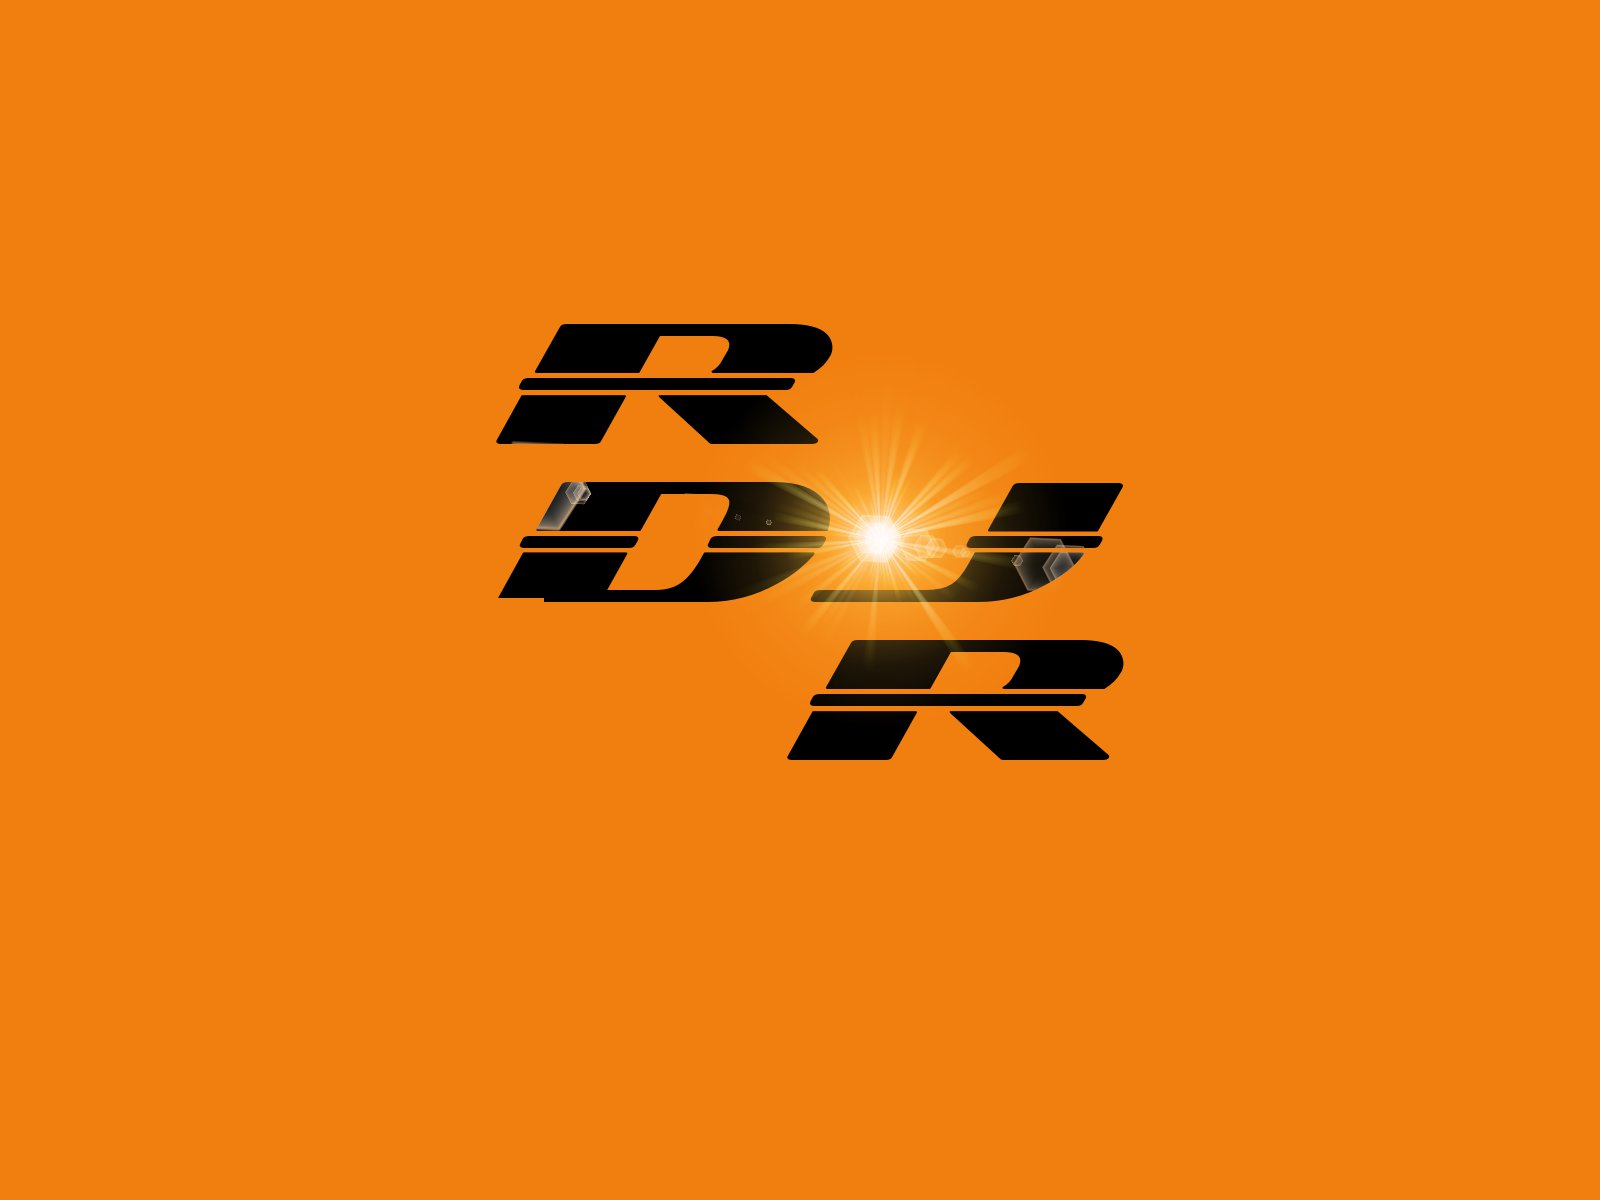 Rdjr2g ya tenemos nuevo logo malvernweather Gallery